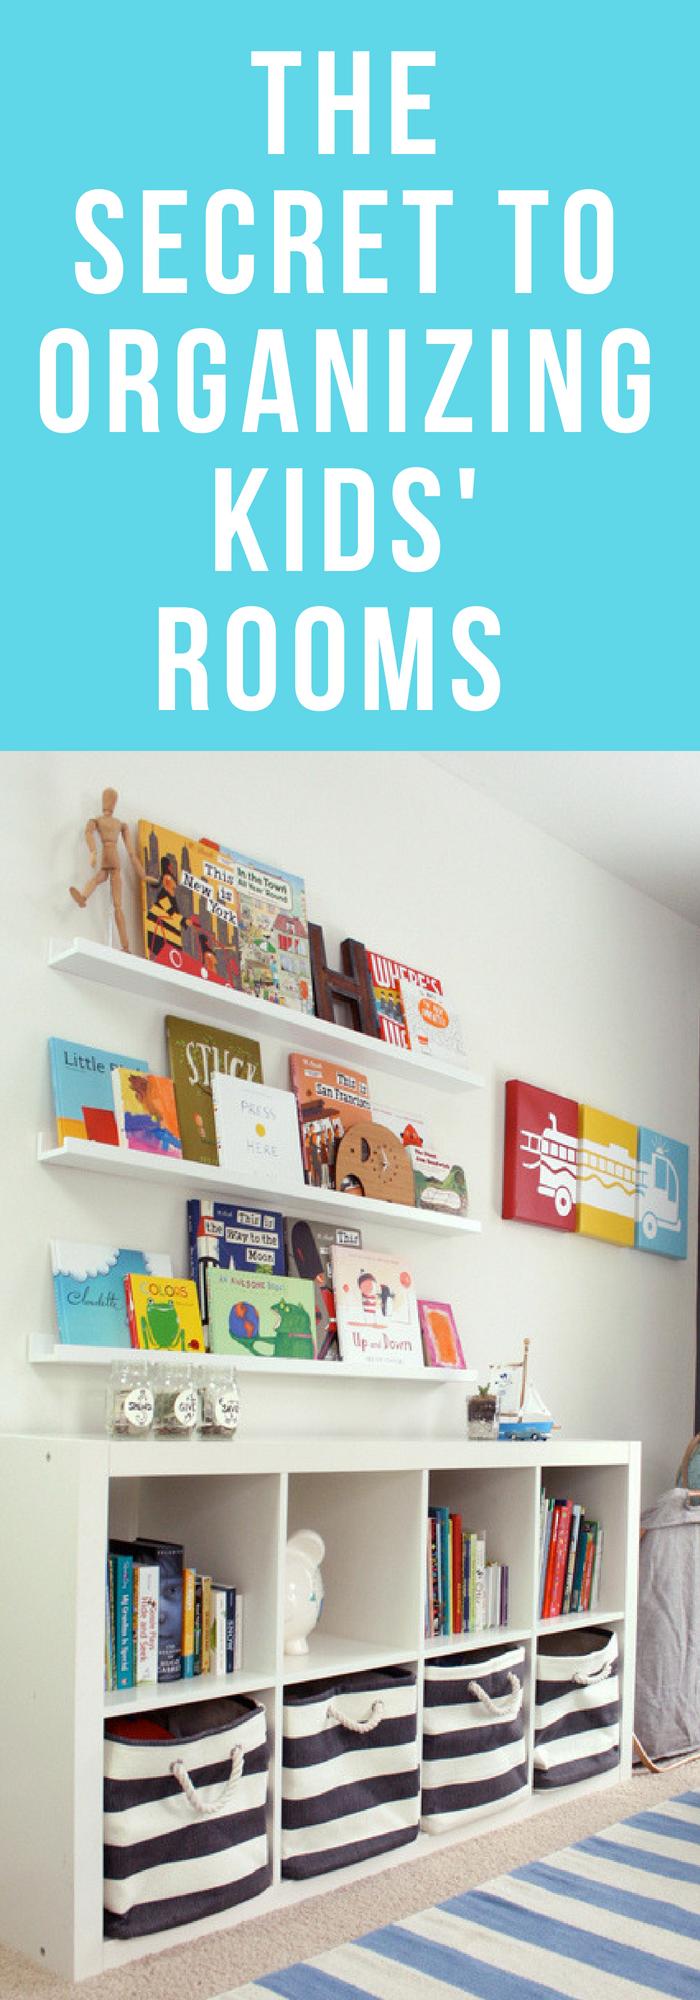 The Secret to Kids Room Organization images